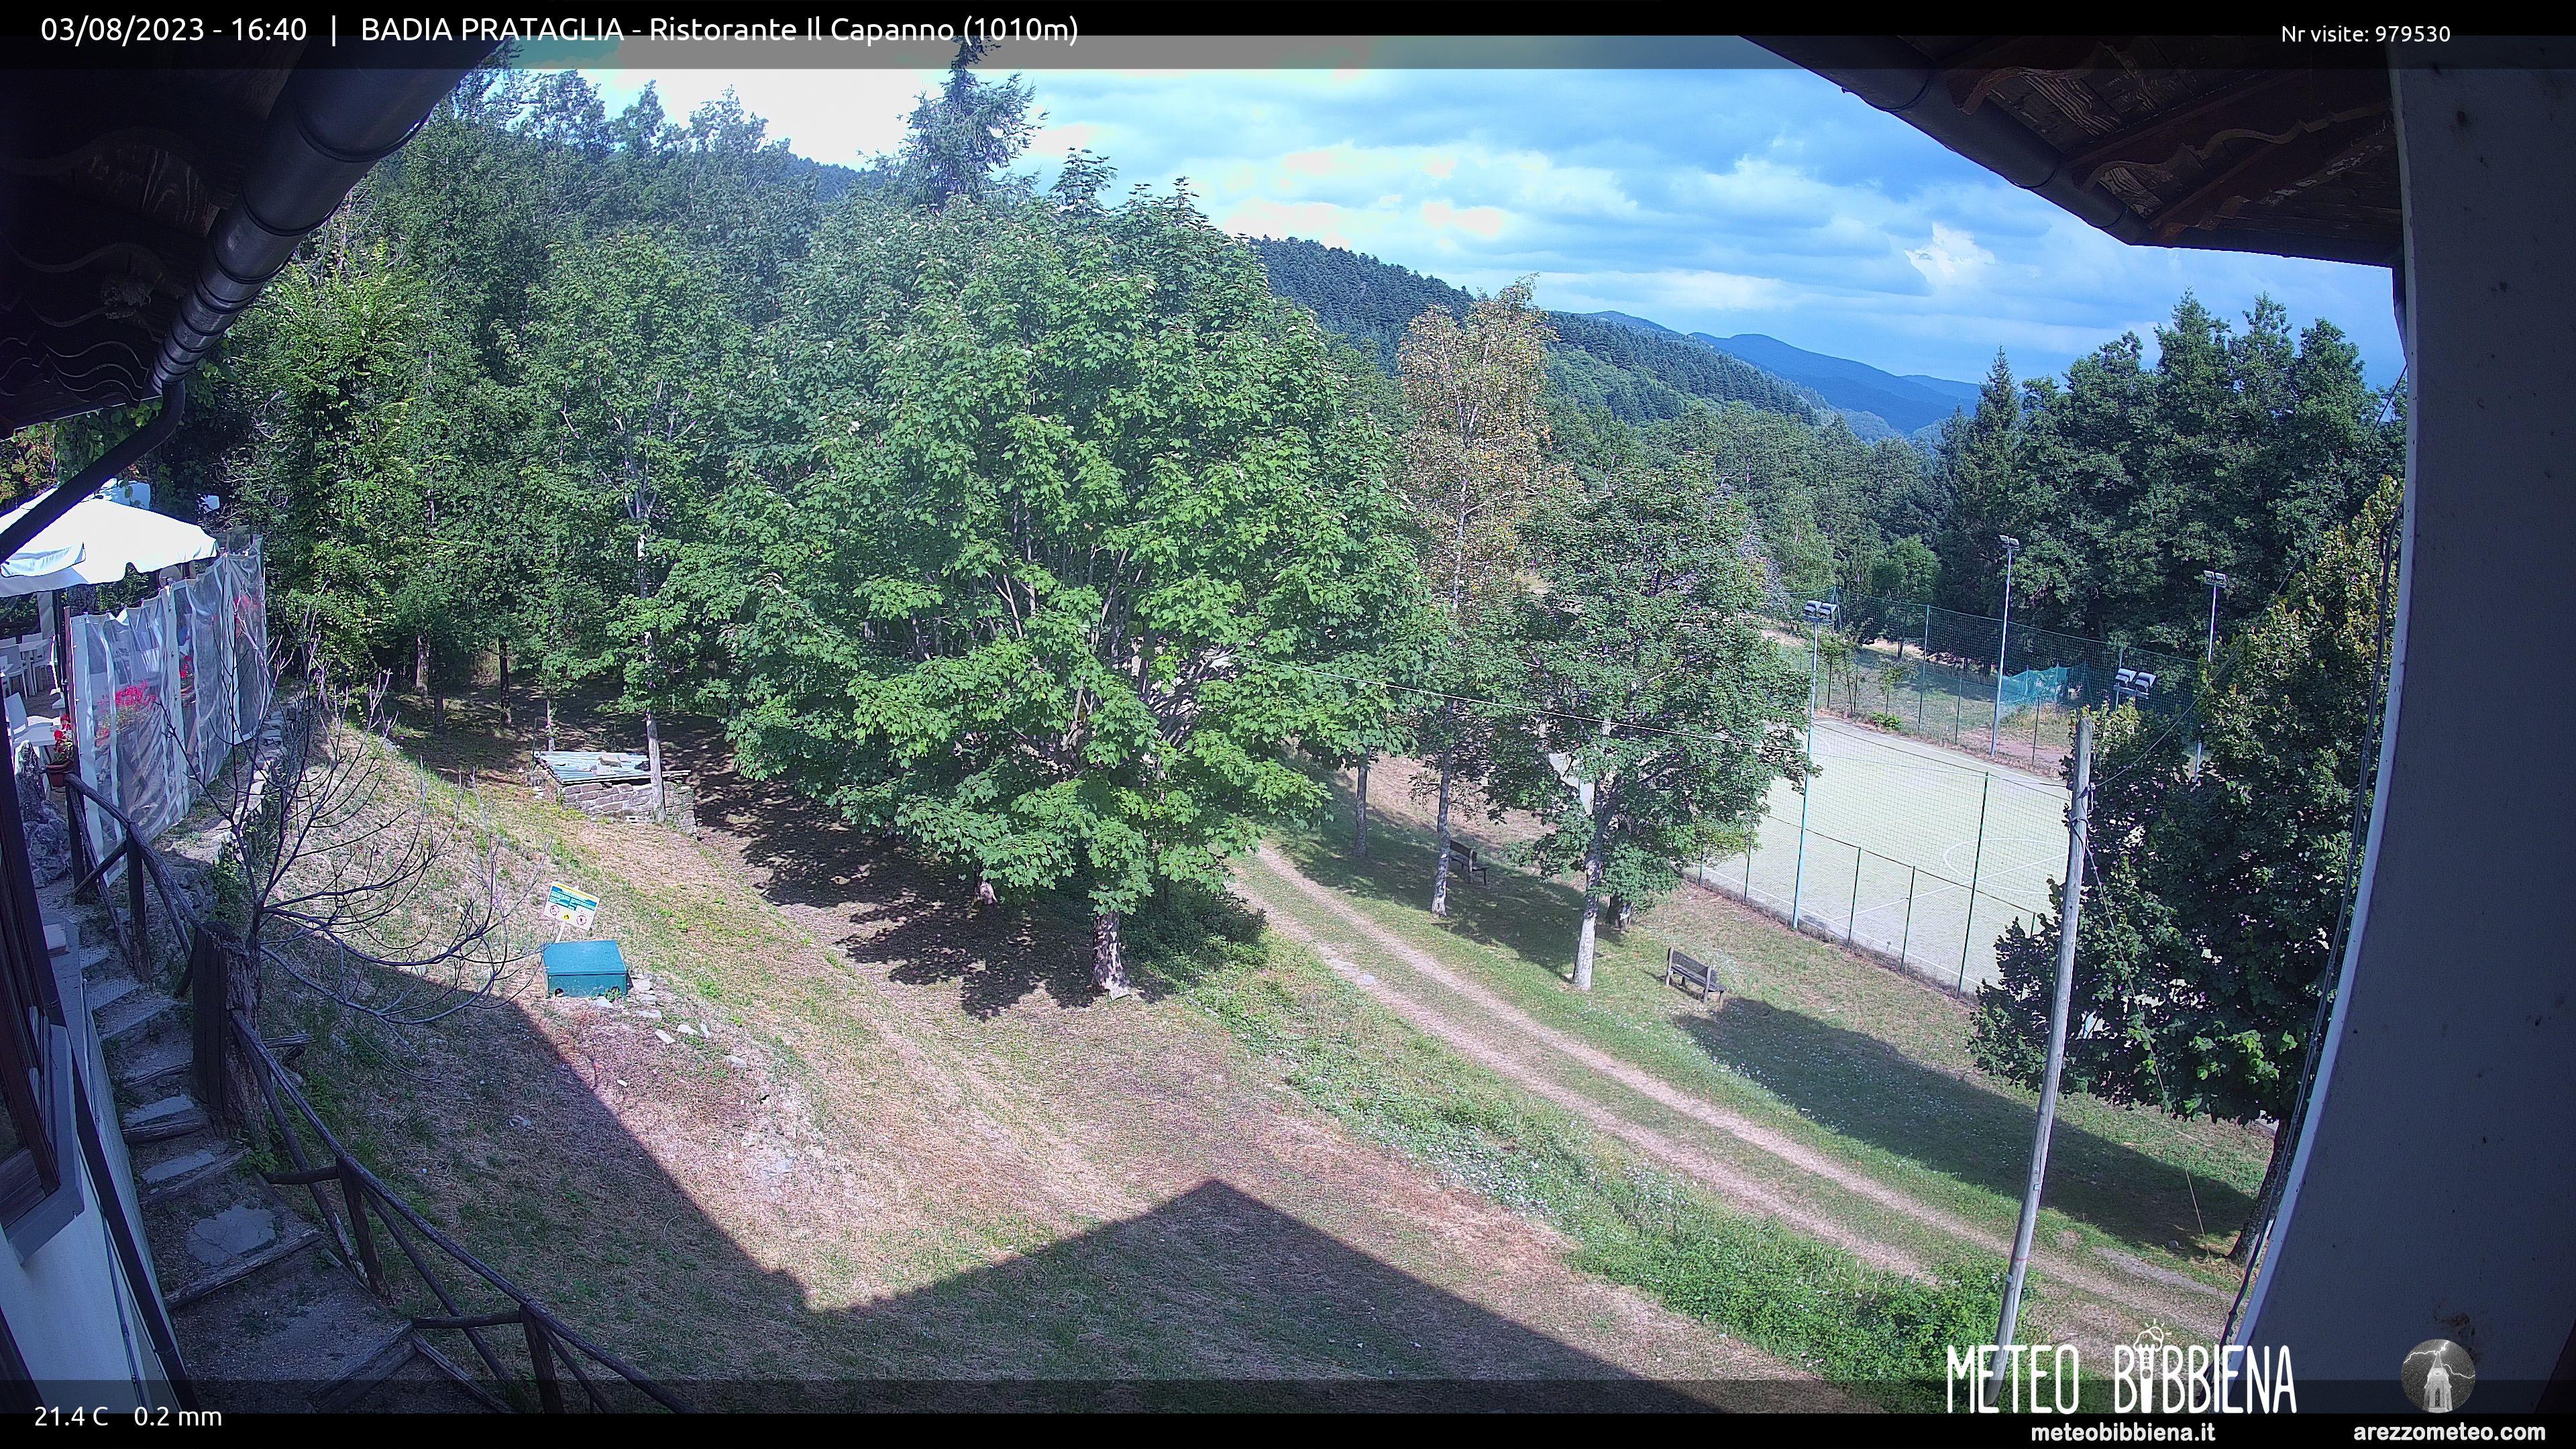 Webcam Badia Prataglia